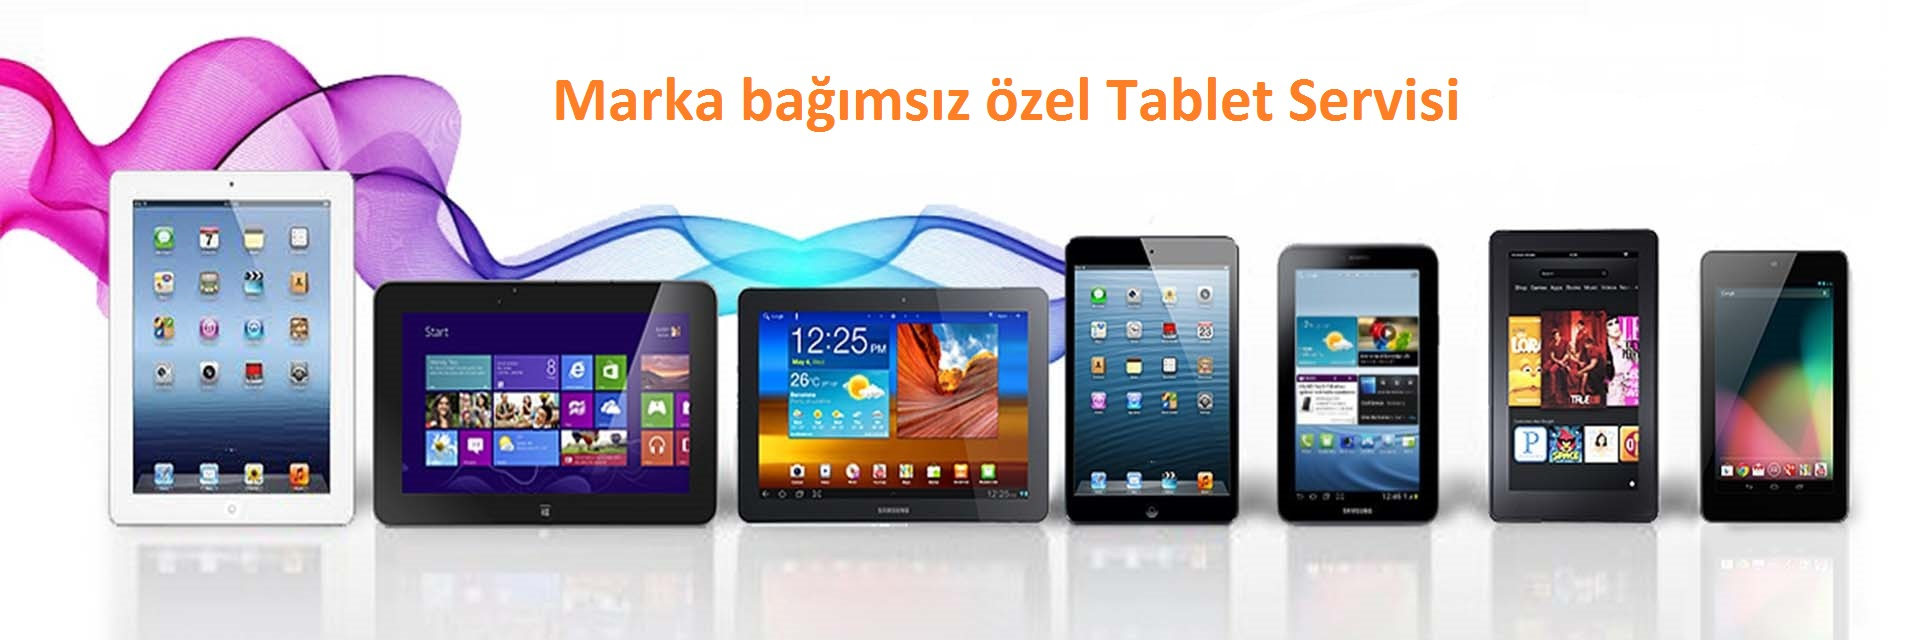 Bursa Tablet Servisi